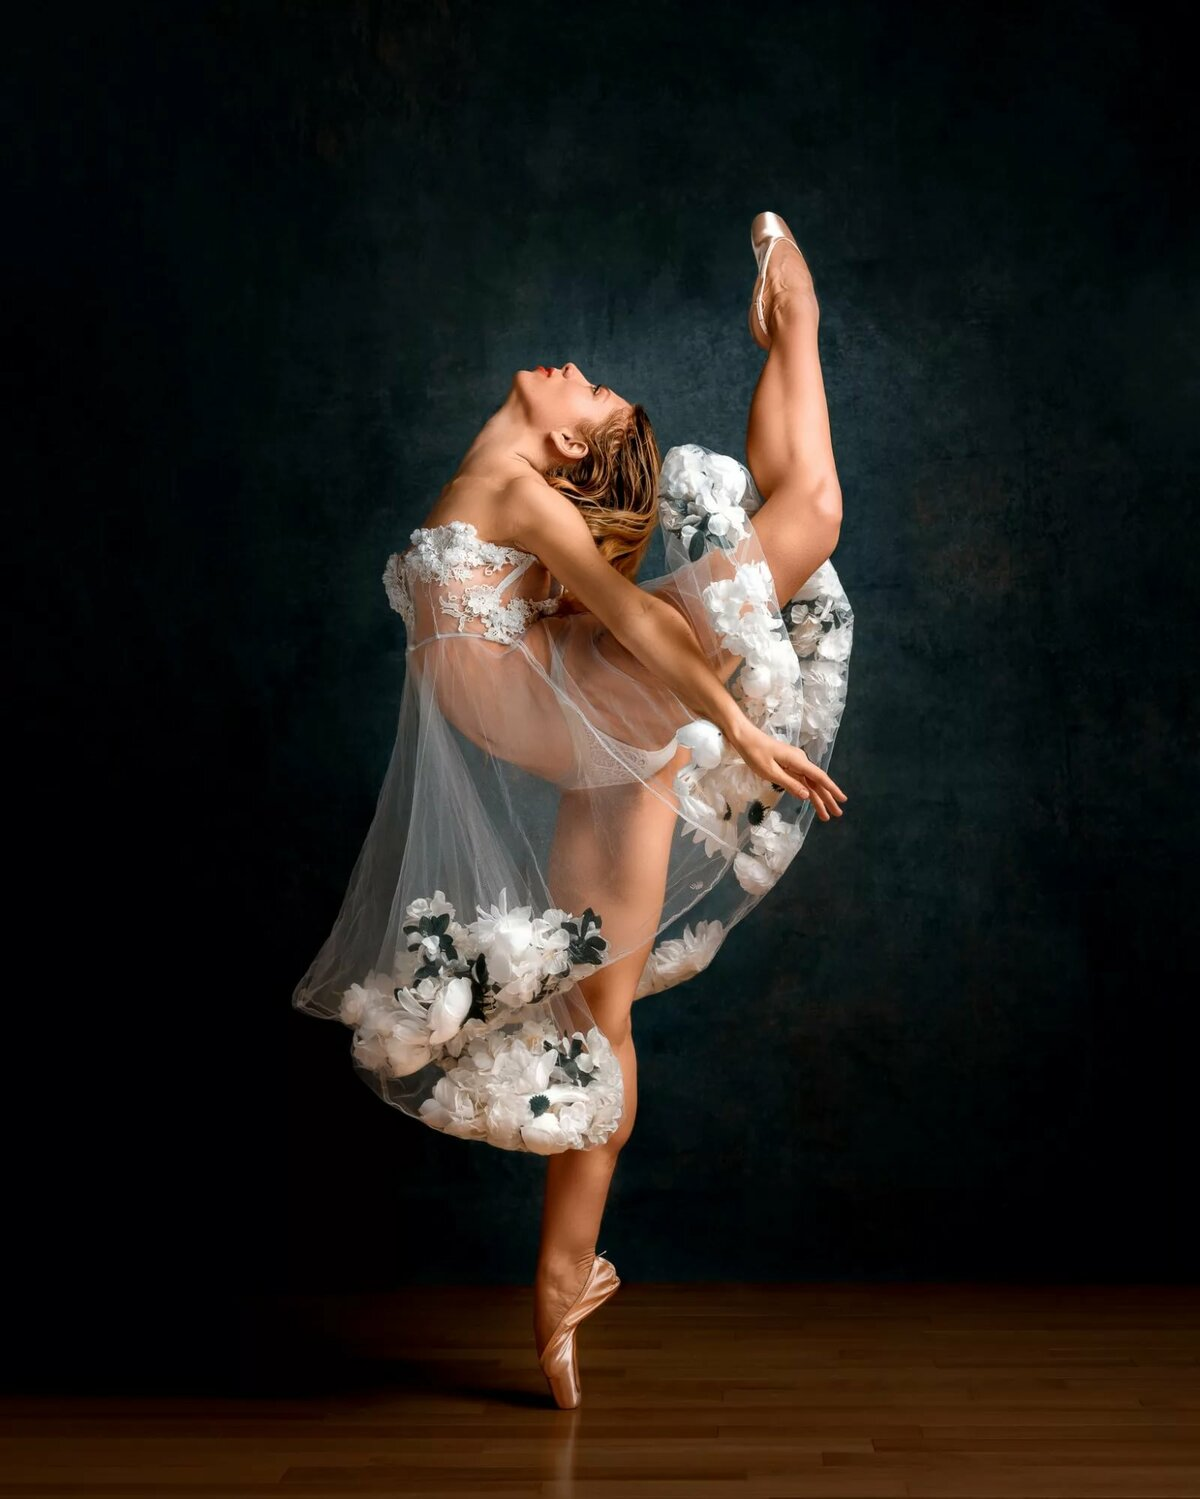 Танцовщица красивая картинка